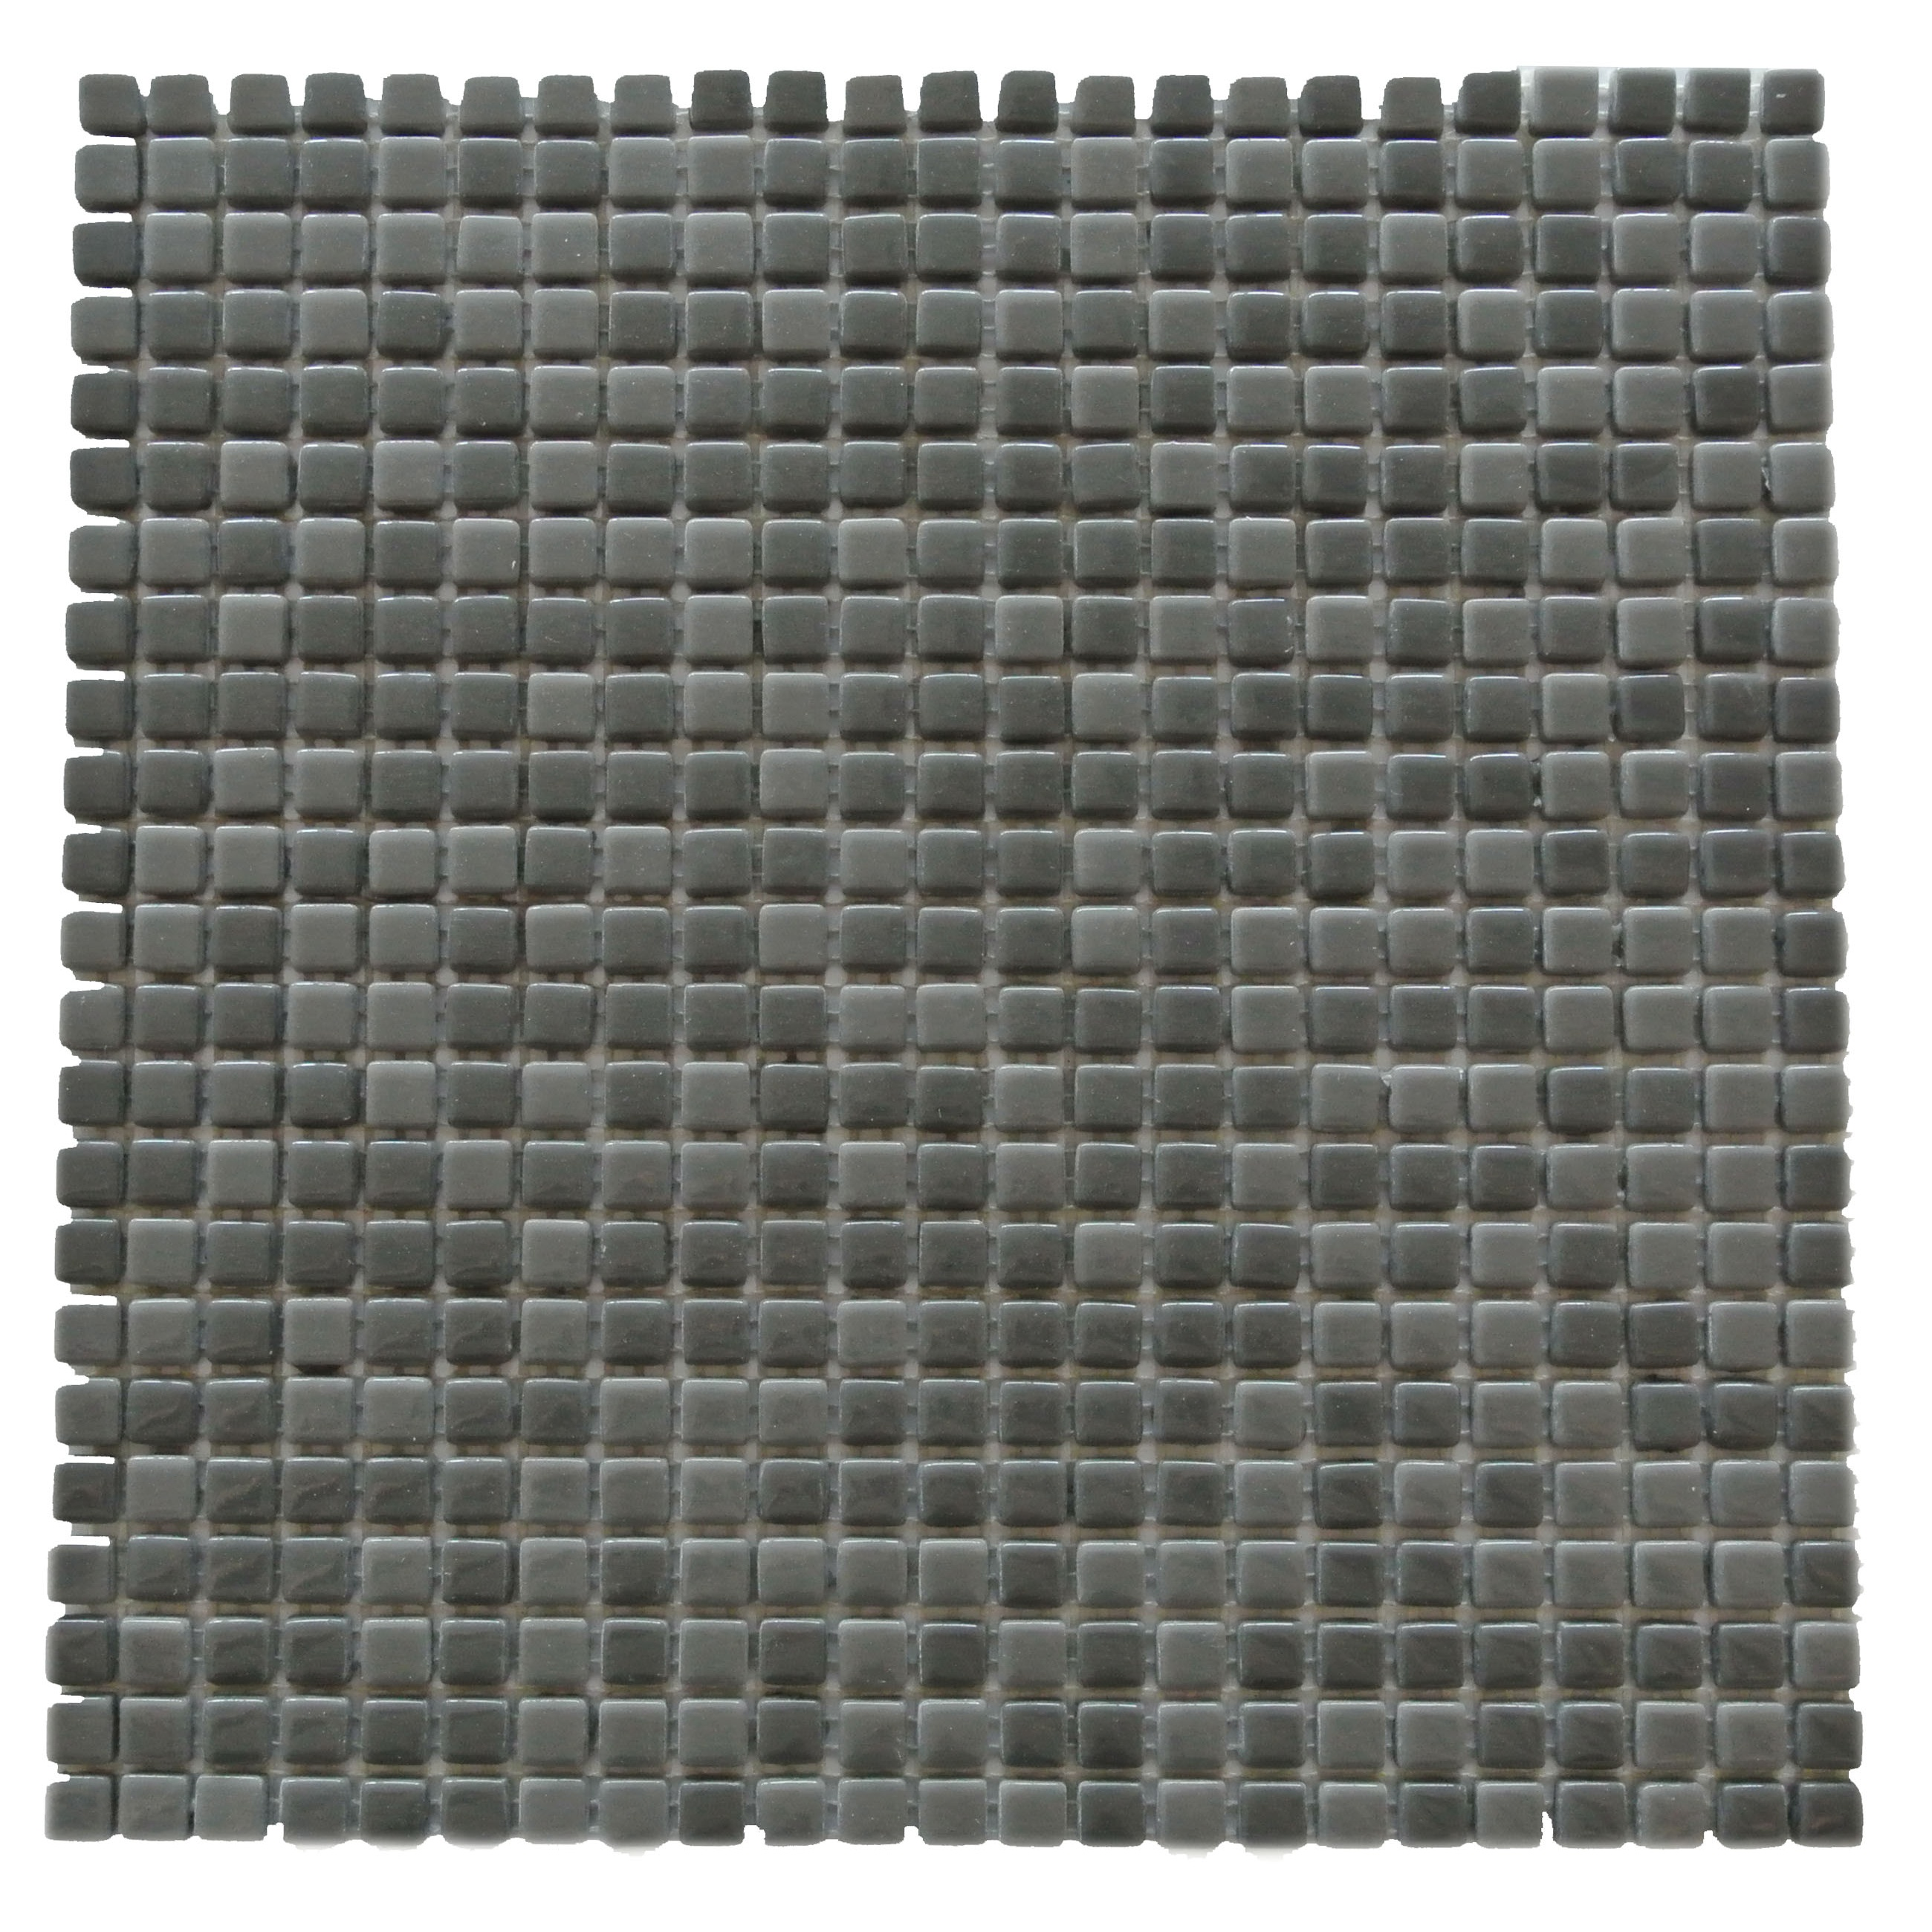 "Abolos- Full Body 0.5"" x 0.5"" Glass Mosaic Backsplash Tile in Dark Gray (5.45sqft - 5pc Box)"